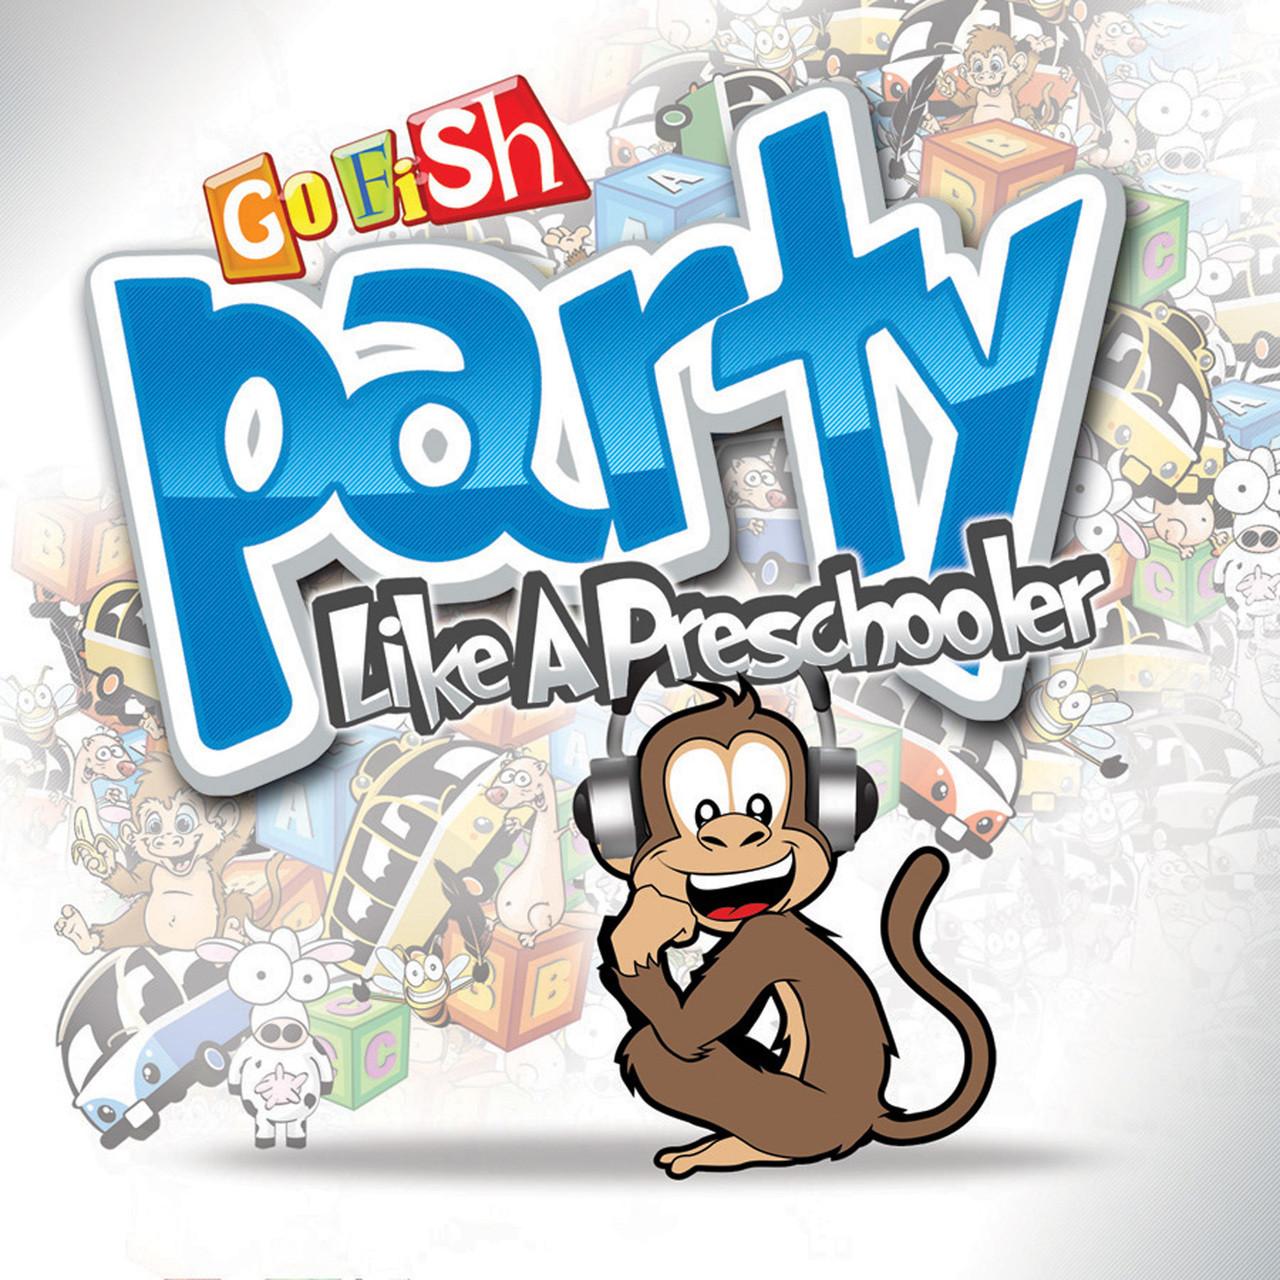 Party Like A Preschooler CD